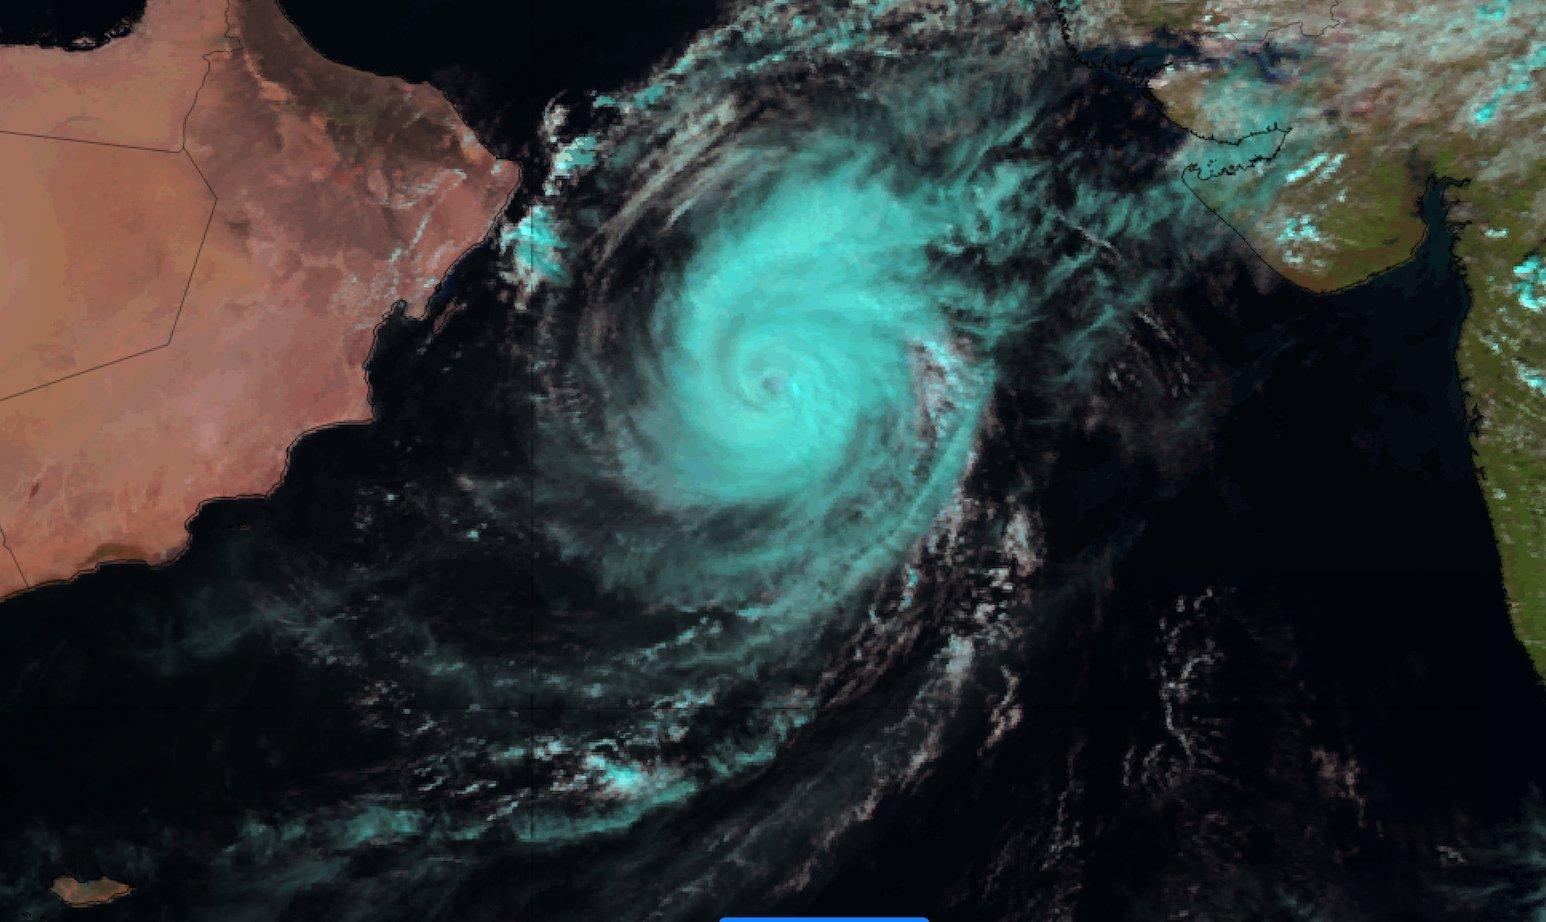 Metosat-8 Natural Colour RGB image 29 Oct 09:00 UTC